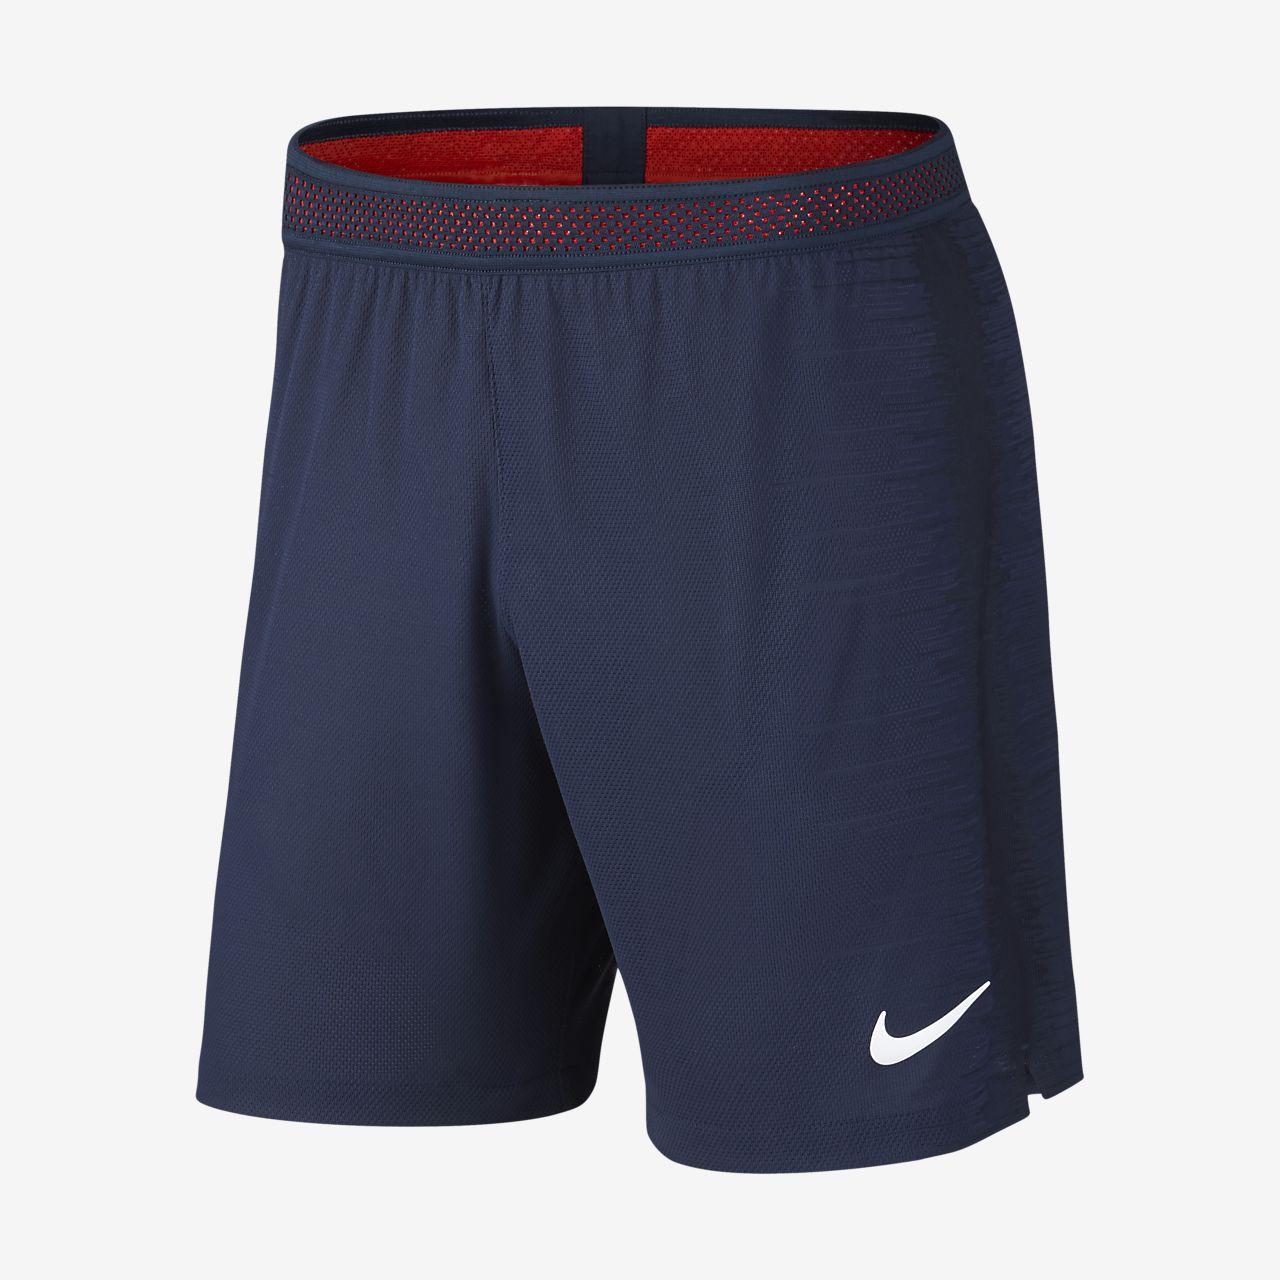 2018/19 Paris Saint-Germain Vapor Match Home/Away Men's Football Shorts